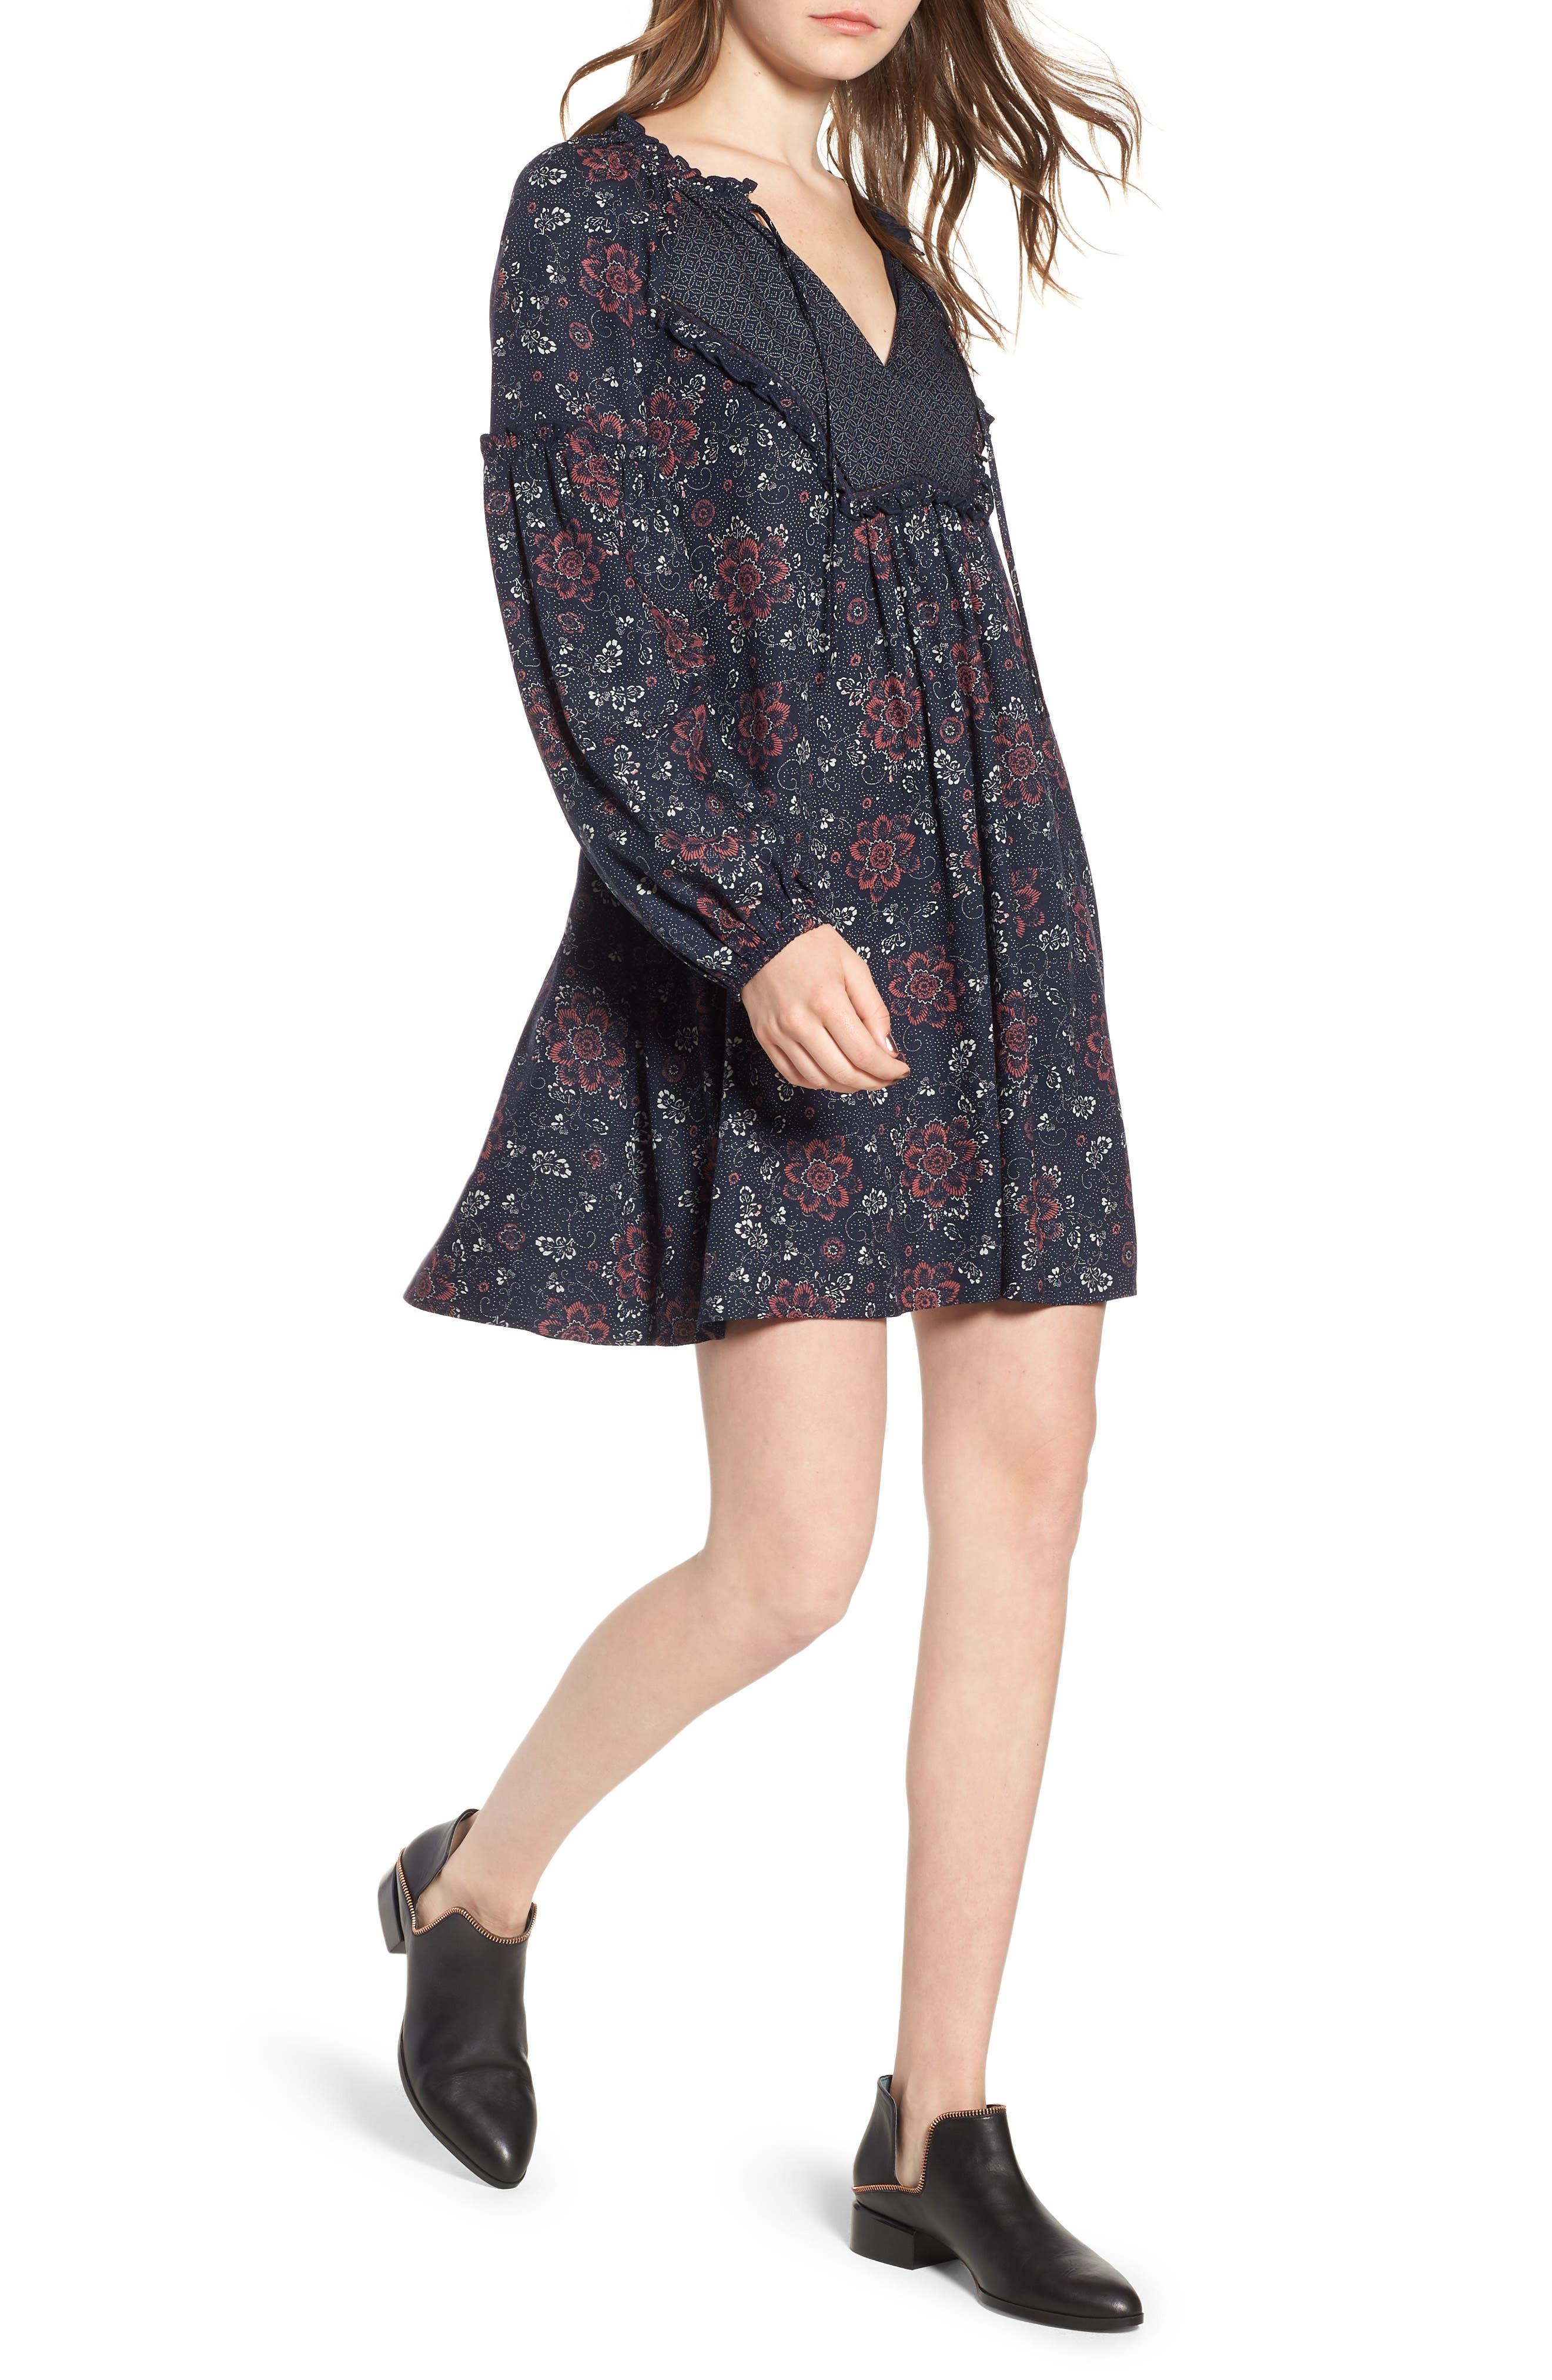 Mix Print Peasant Dress,                             Main thumbnail 1, color,                             NAVY NIGHT WOVEN FLORAL MIX